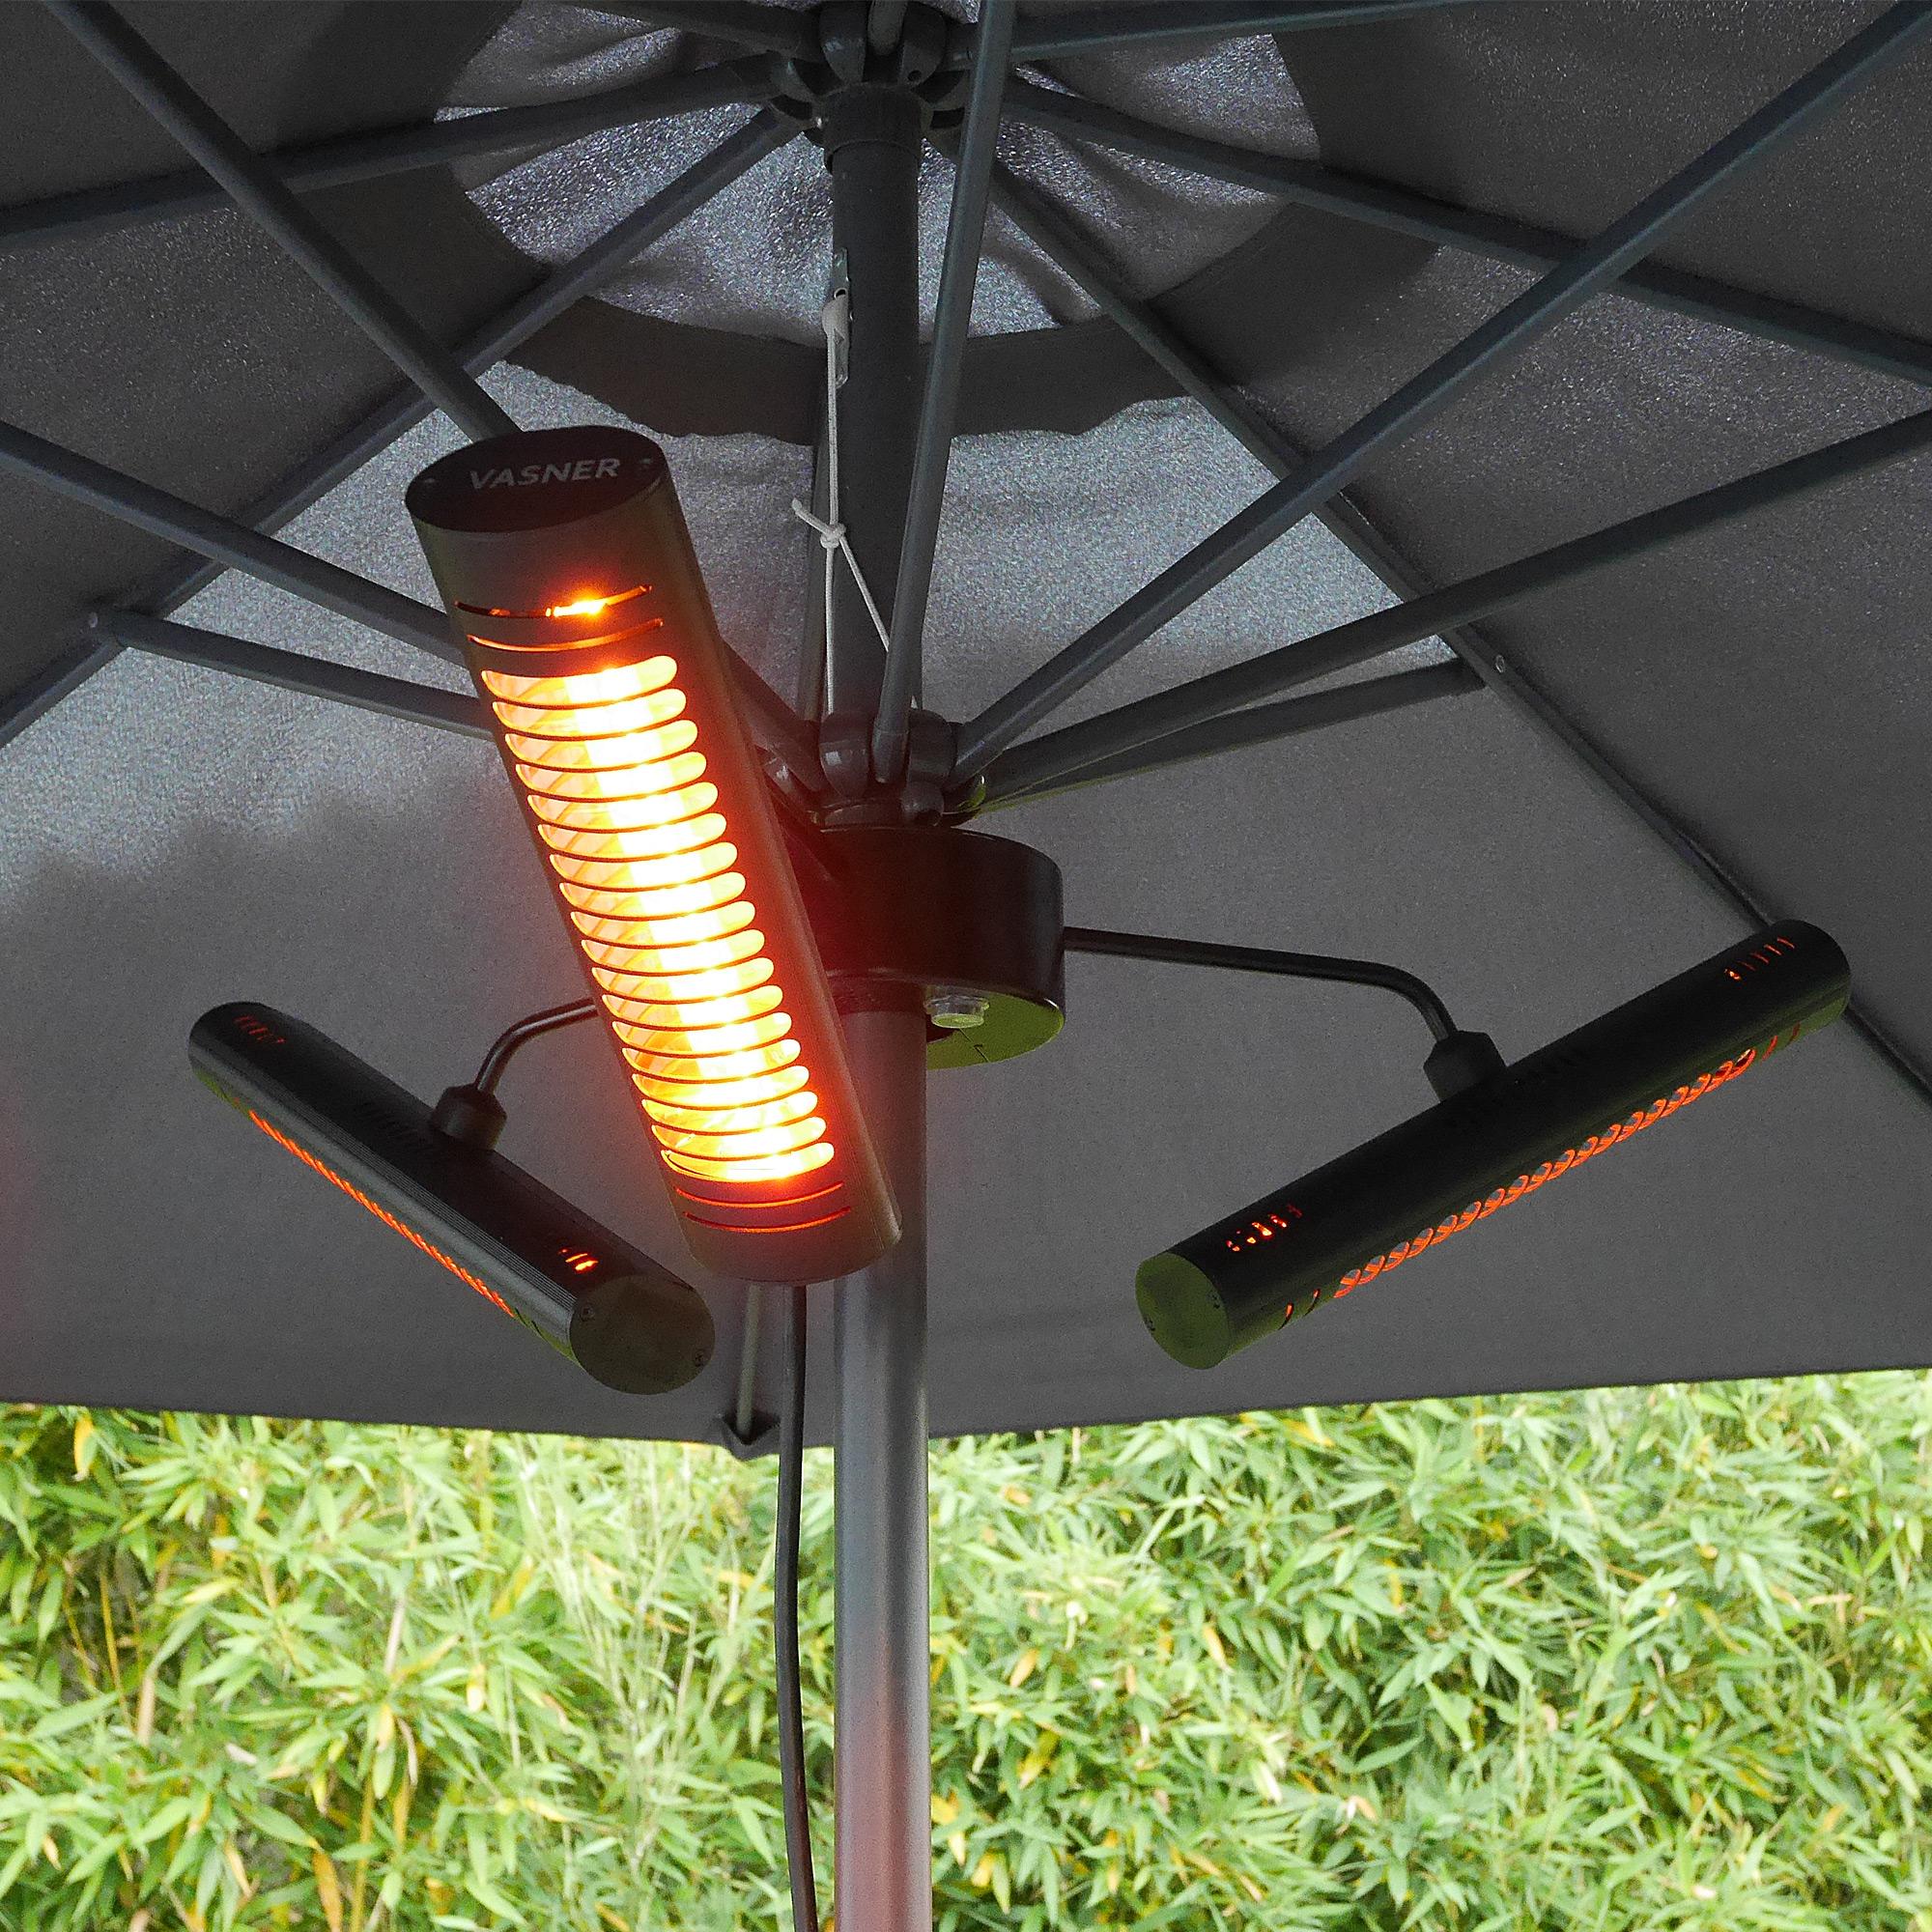 VASNER Umbrella X20 Parasol Patio Heater 2000 Watts Black